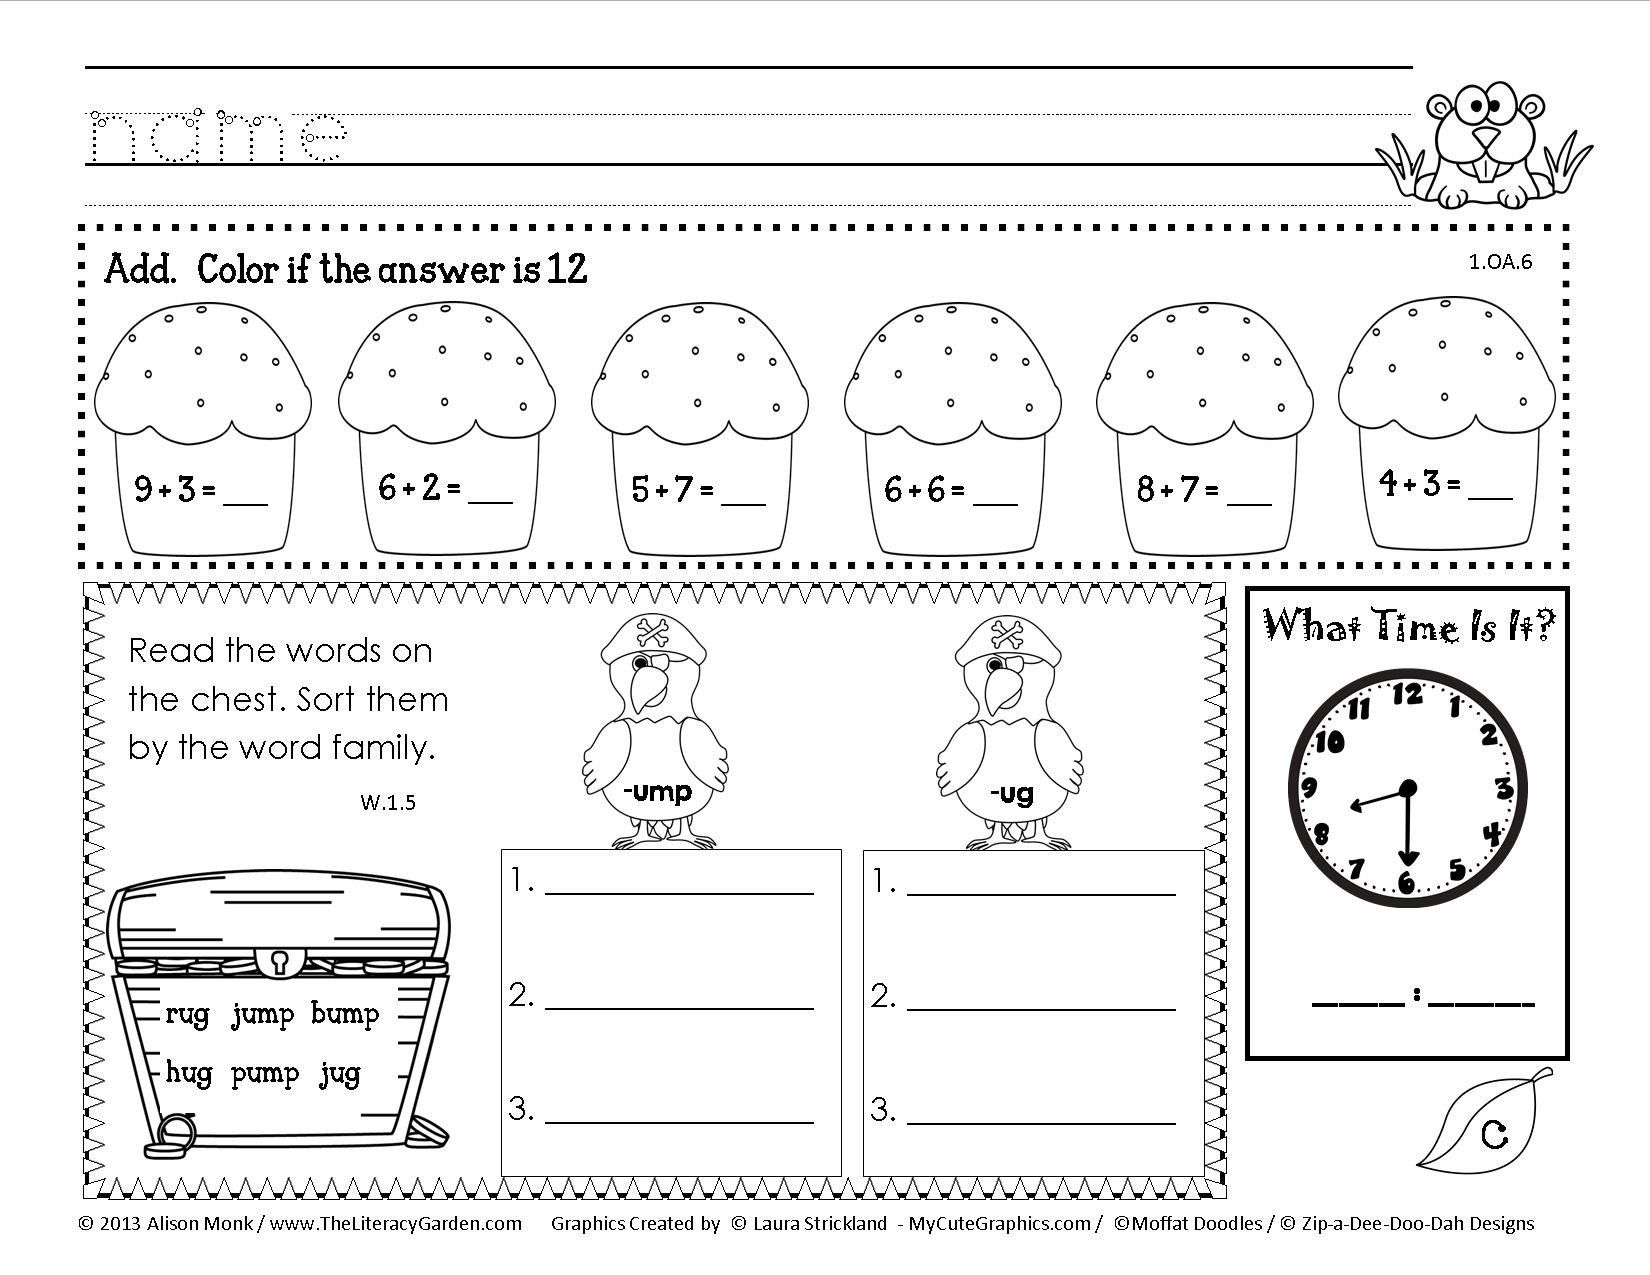 Array Worksheets For 2nd Graders Garden Arrays Math Worksheet In 2020 Morning Work Array Worksheets Array Math